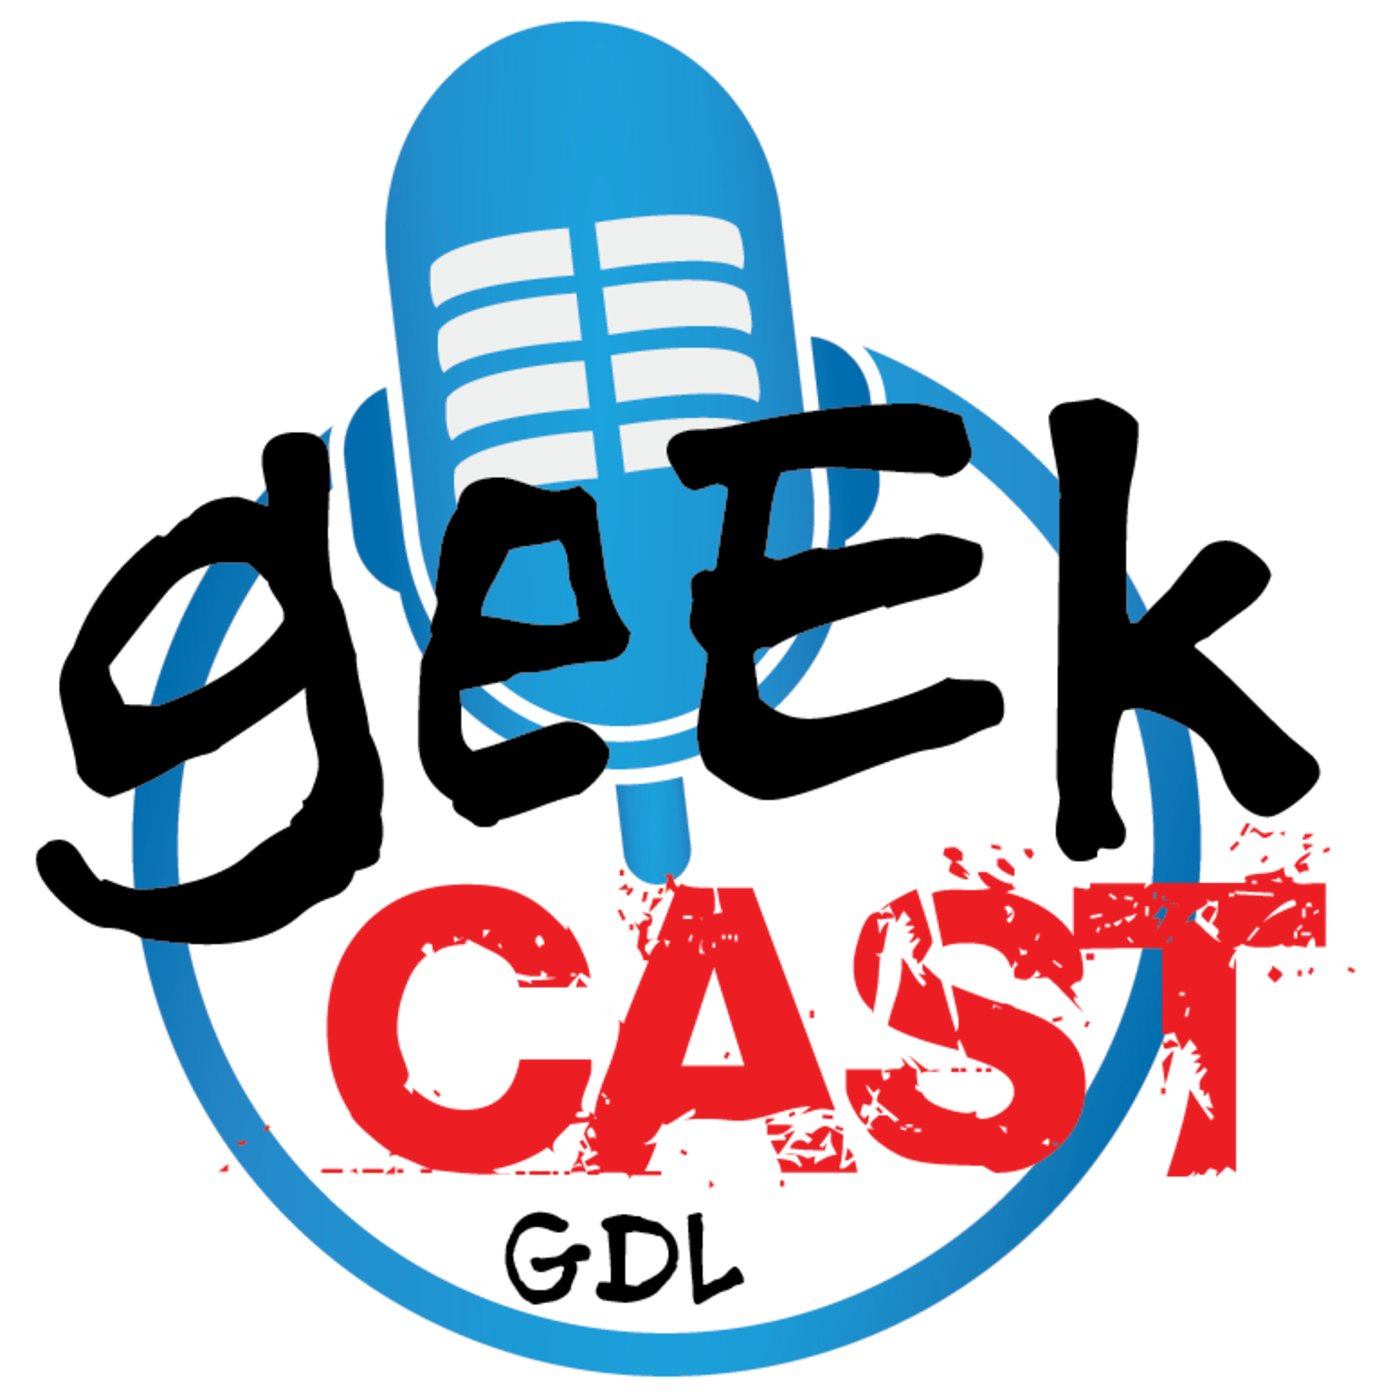 <![CDATA[Podcast de GeekcastGdl]]>